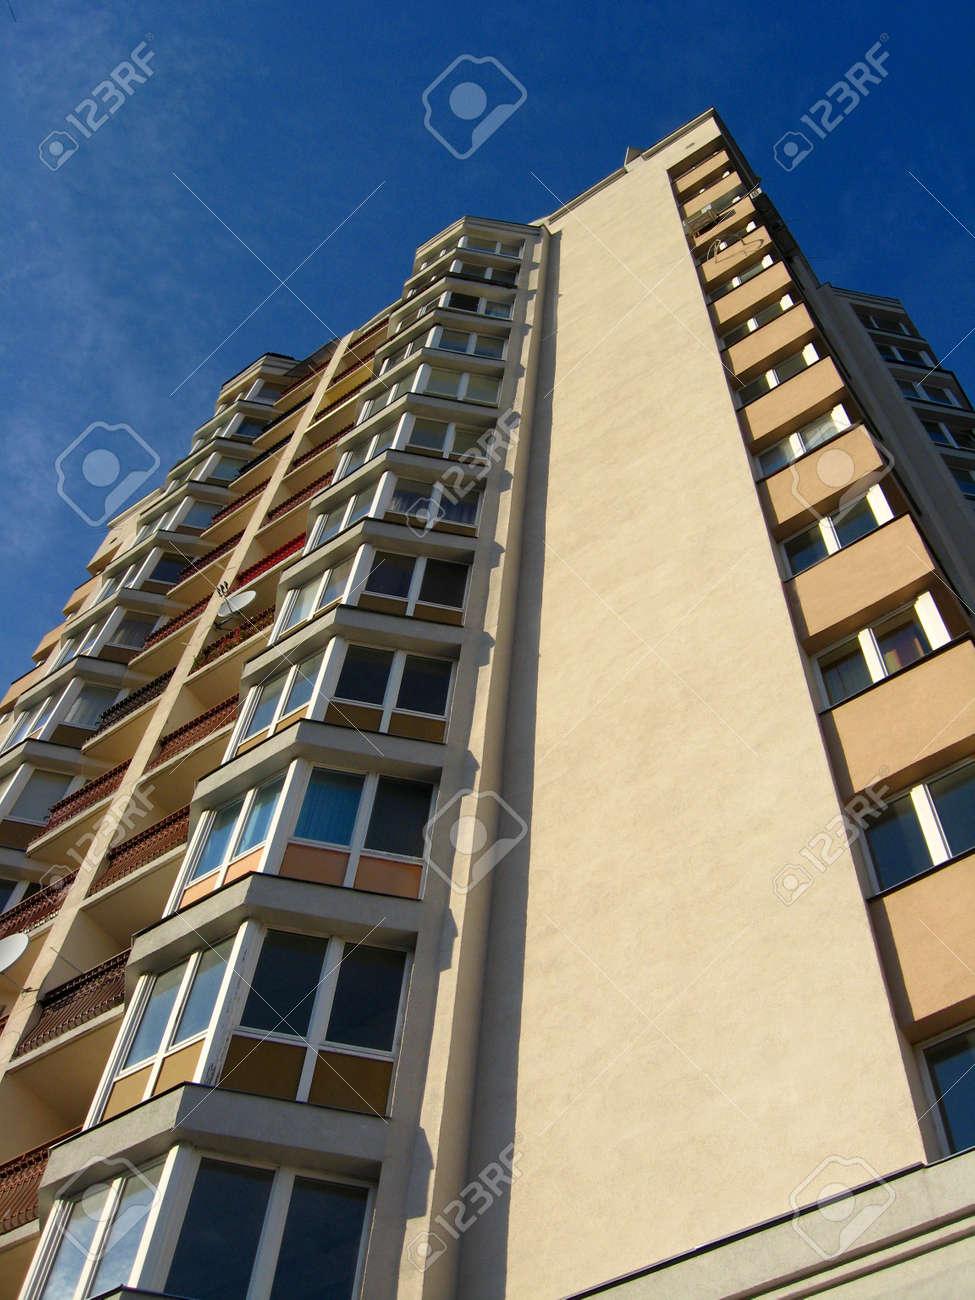 The multi-storey modern house on the blue sky background Stock Photo - 16981236